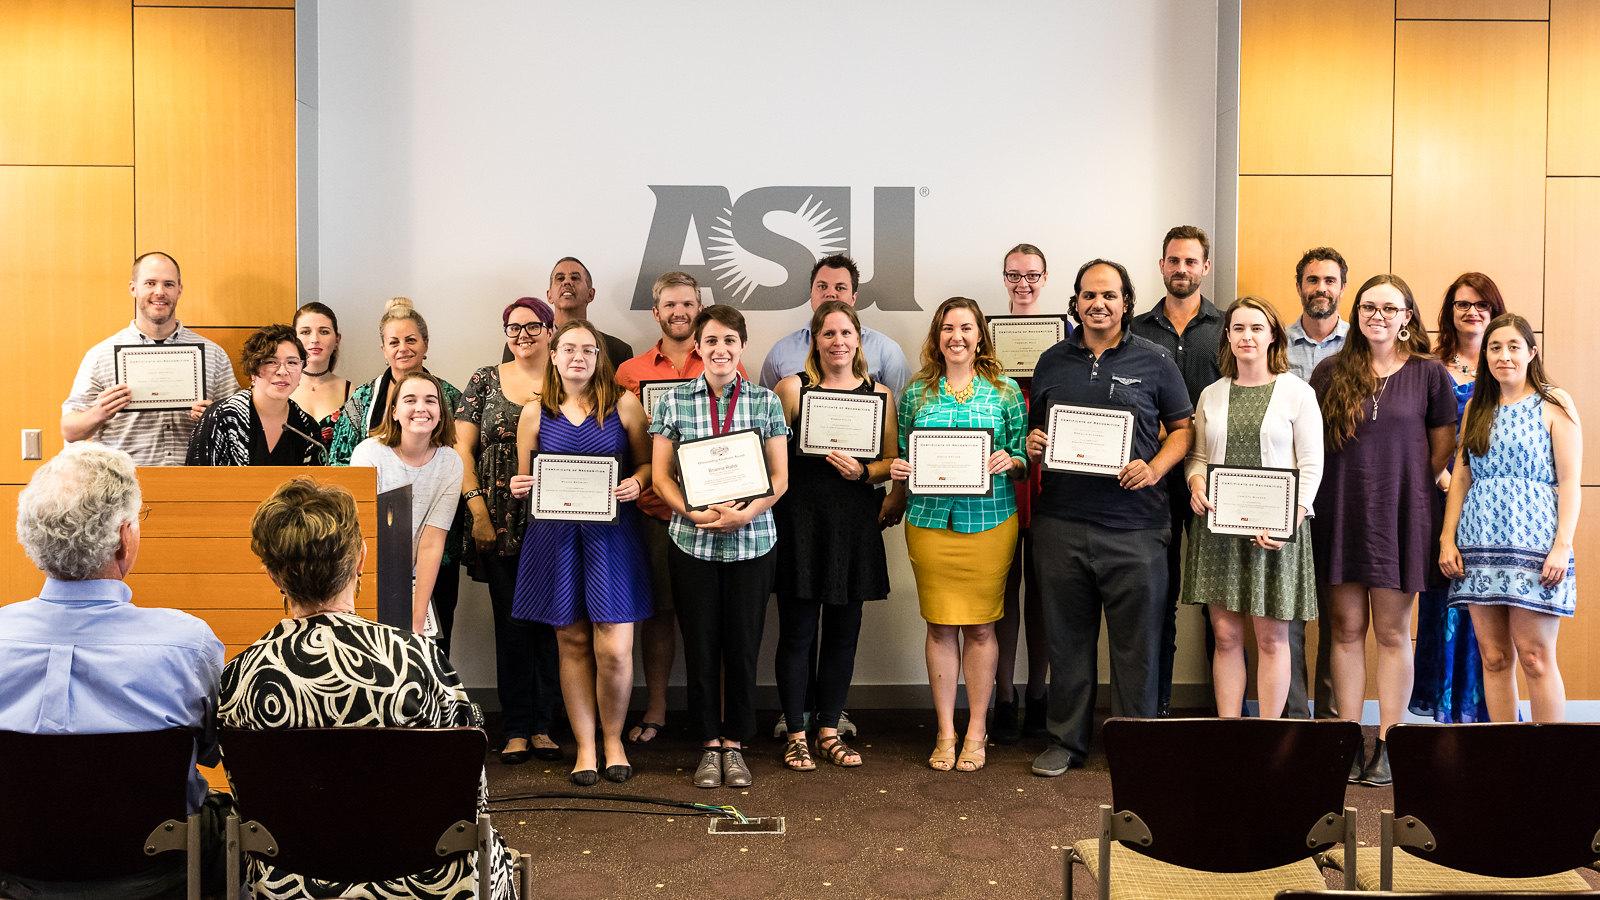 Graduation Reception And Awards Ceremony, 2017